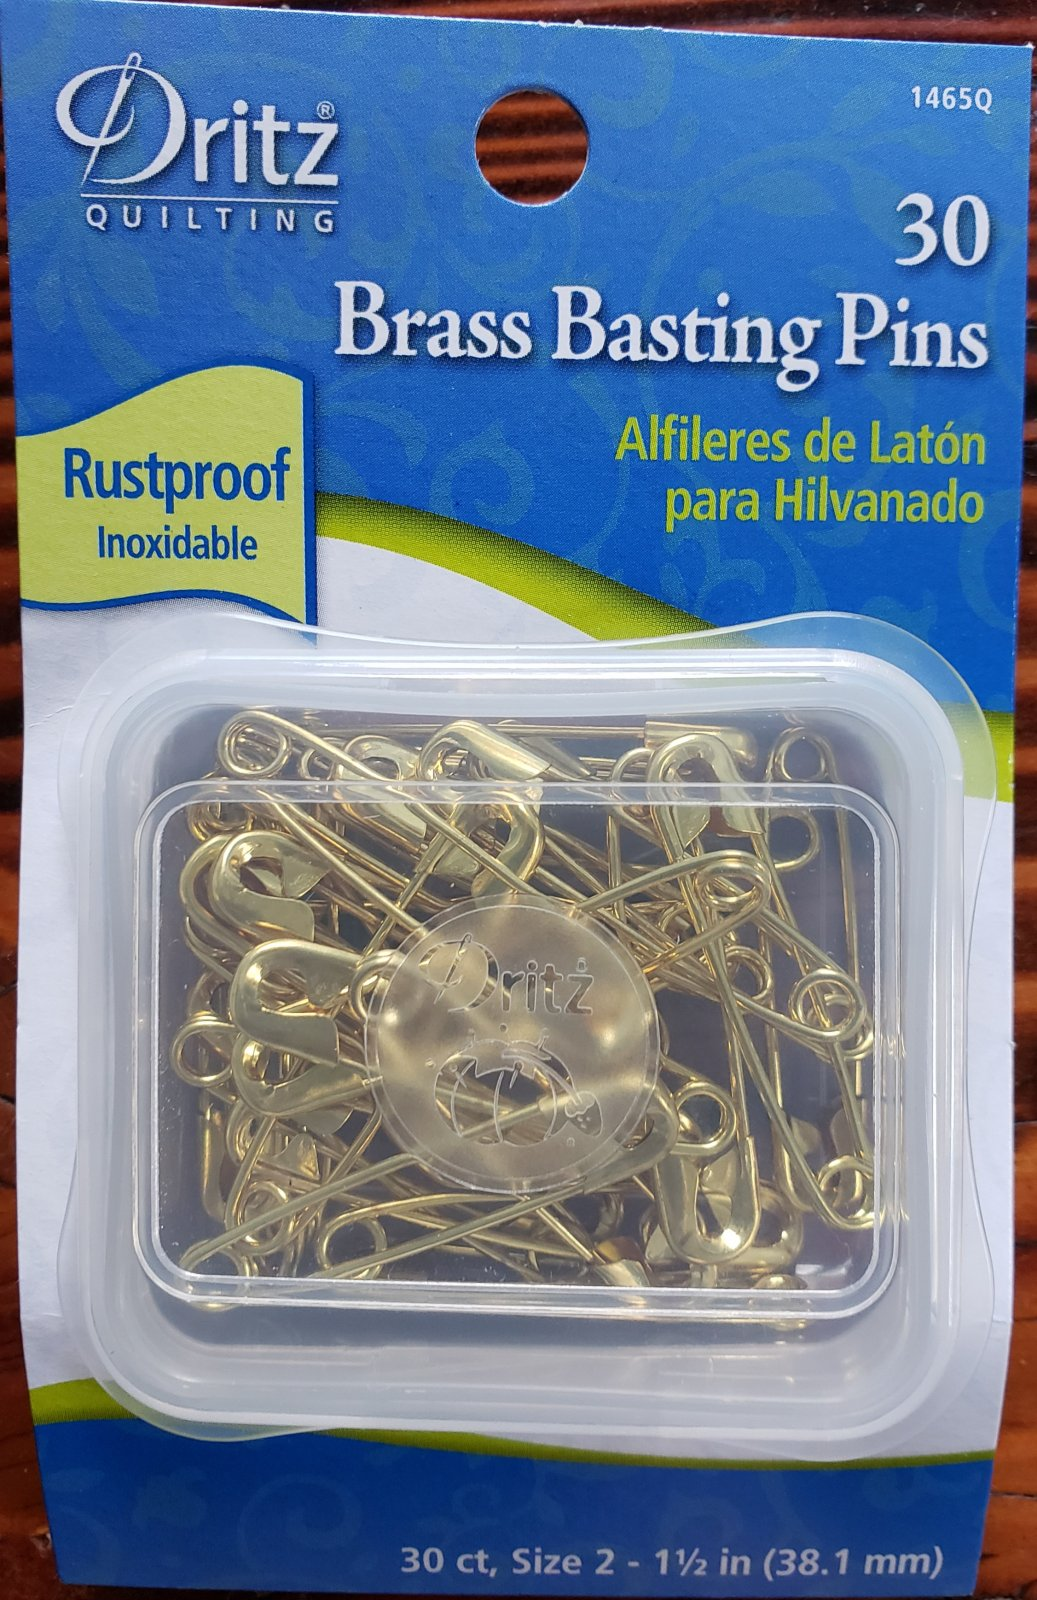 Dritz Quilting Brass Basting Safety Pins 30Ct